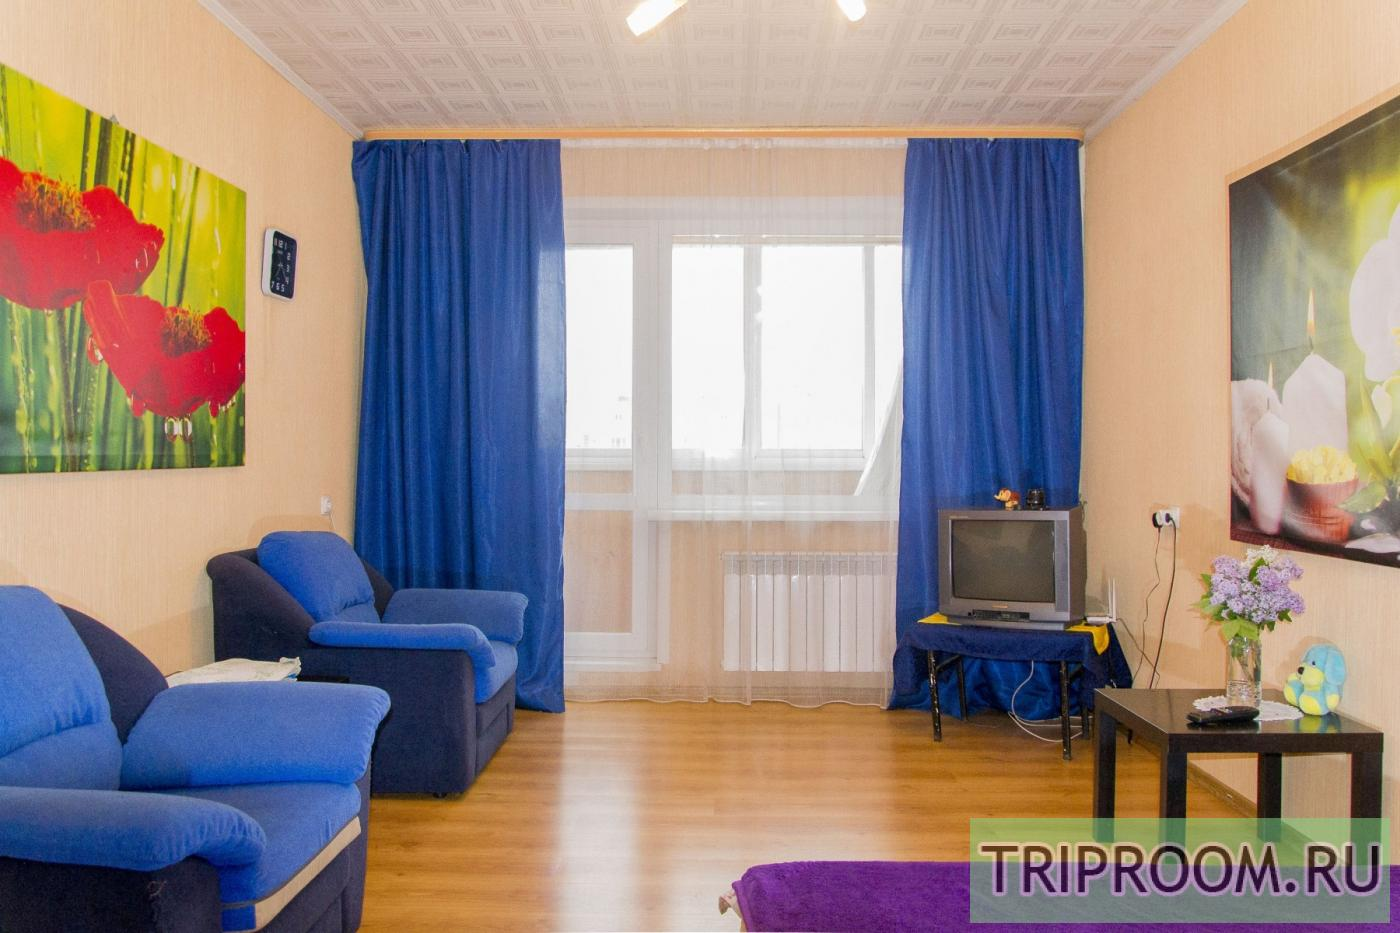 1-комнатная квартира посуточно (вариант № 21406), ул. Стаханова улица, фото № 1